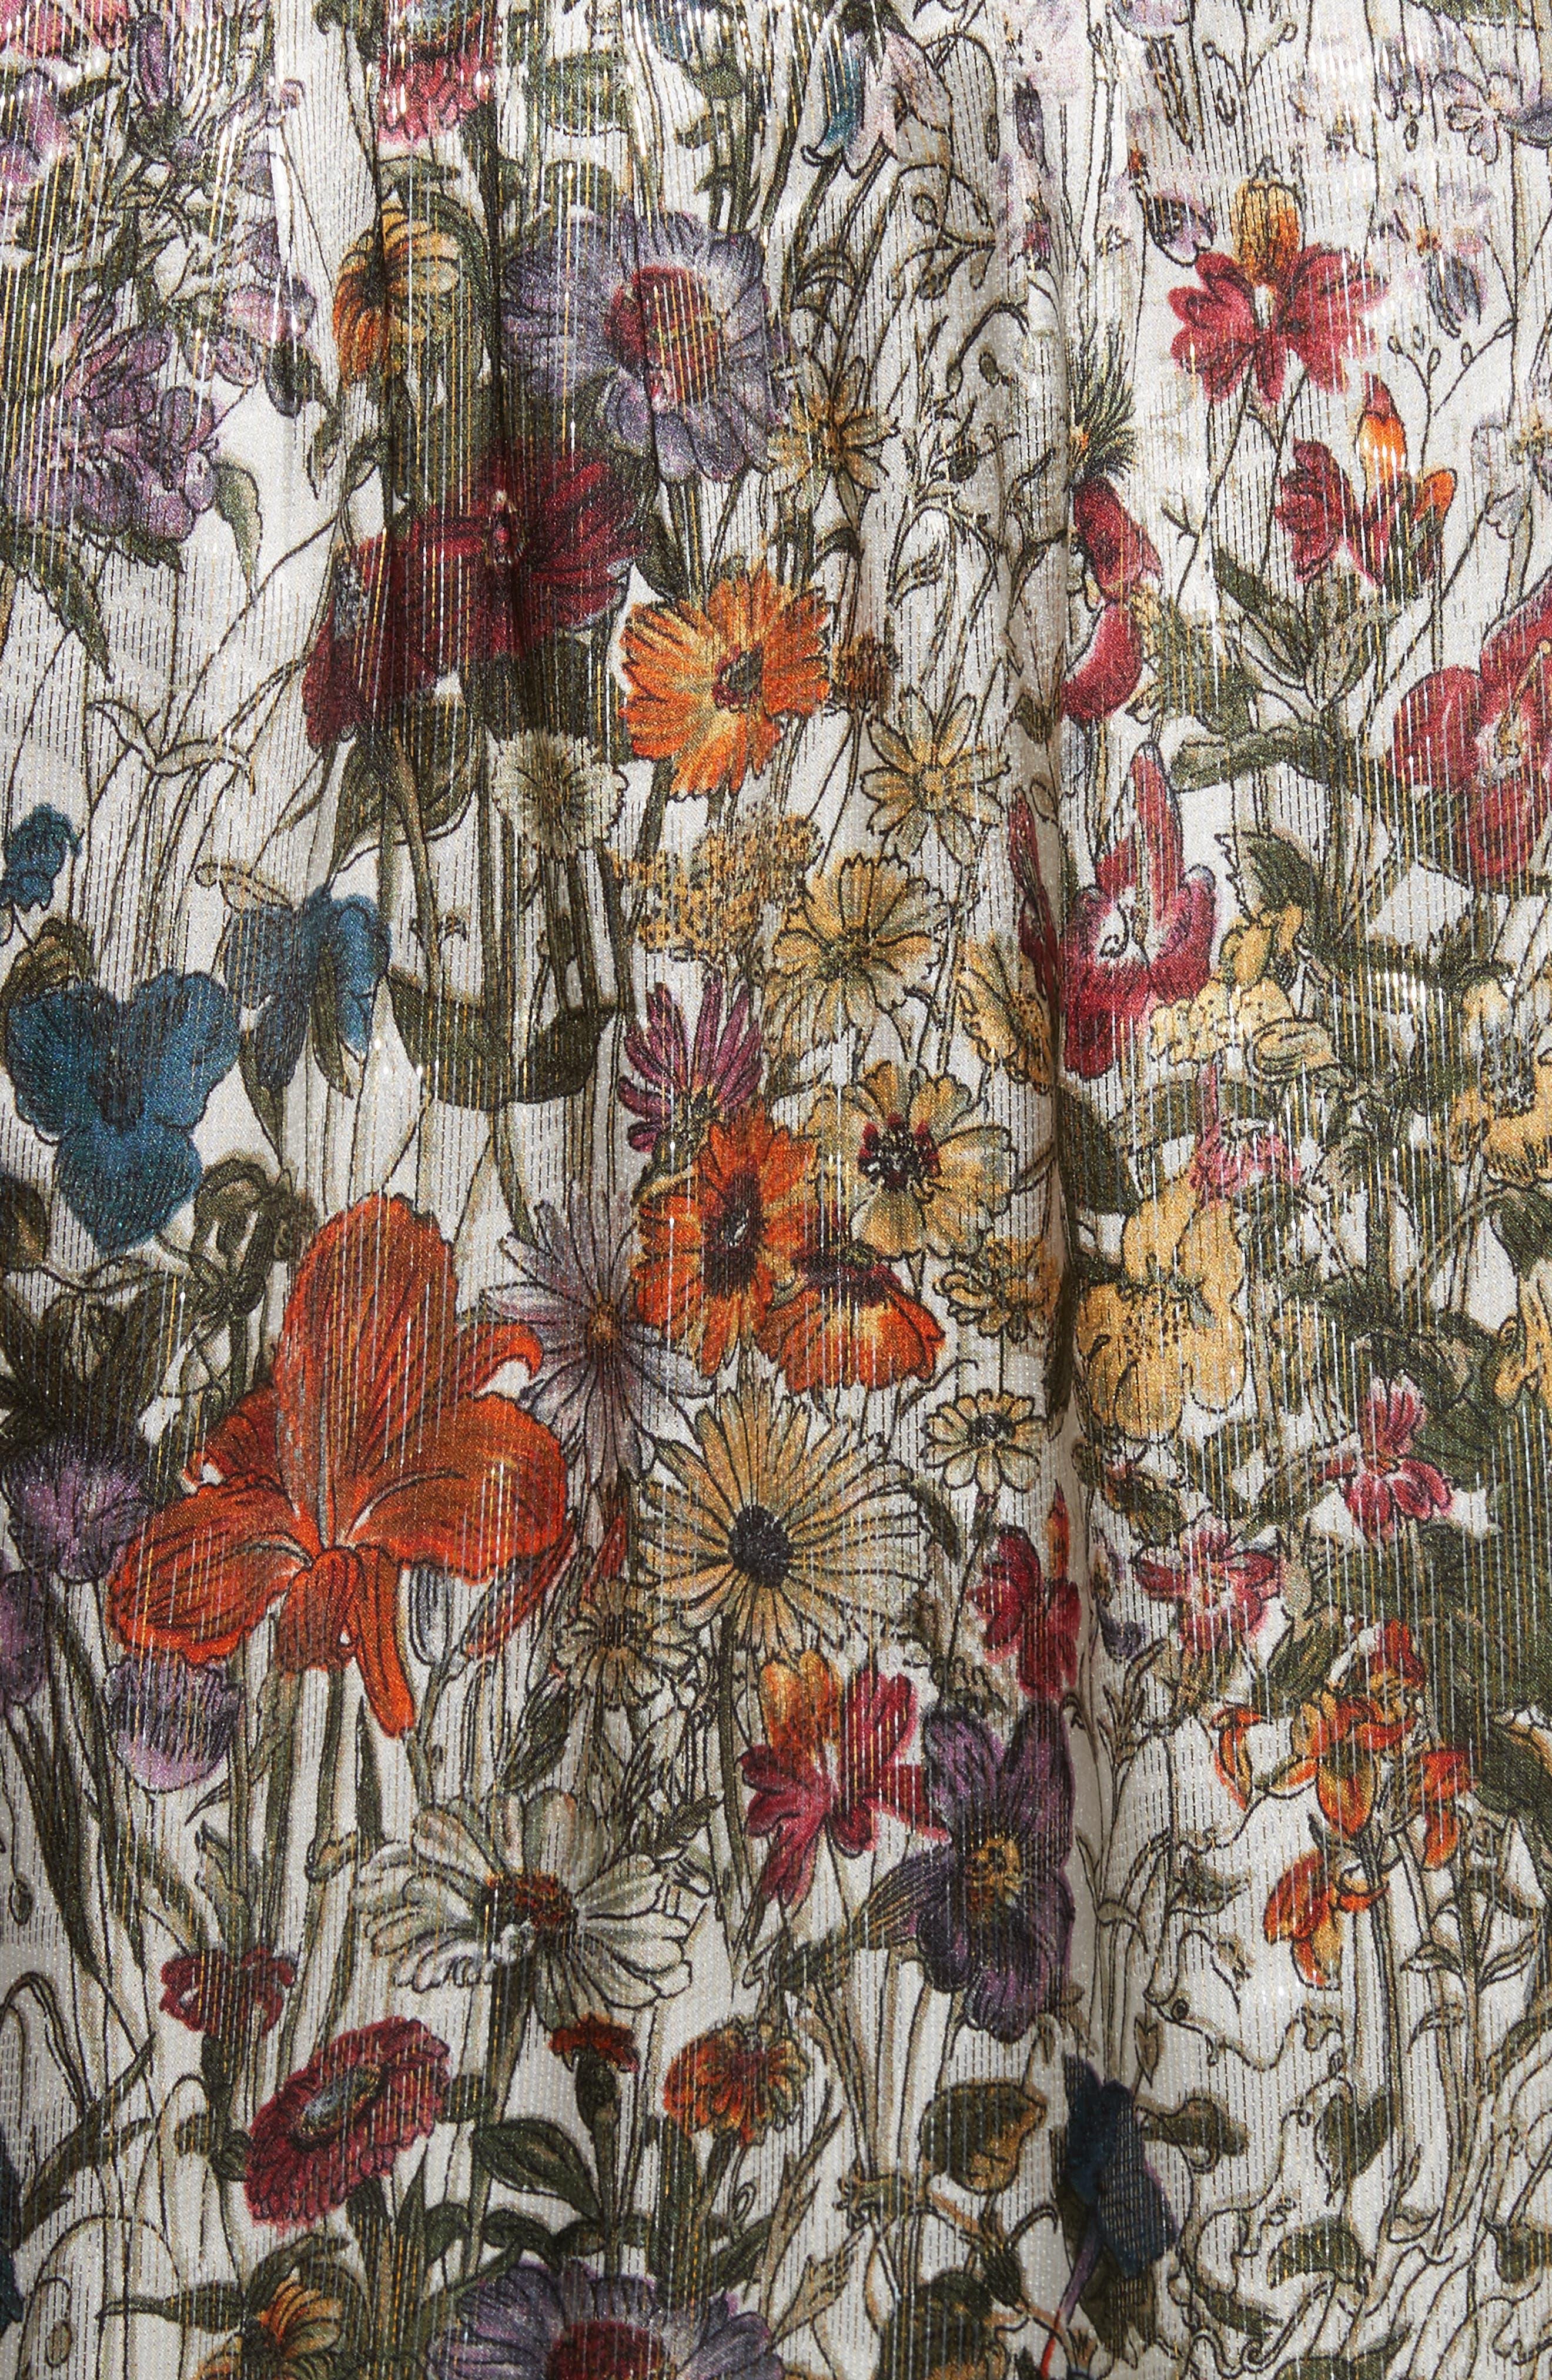 Heidi Metallic Floral Blouse,                             Alternate thumbnail 5, color,                             699